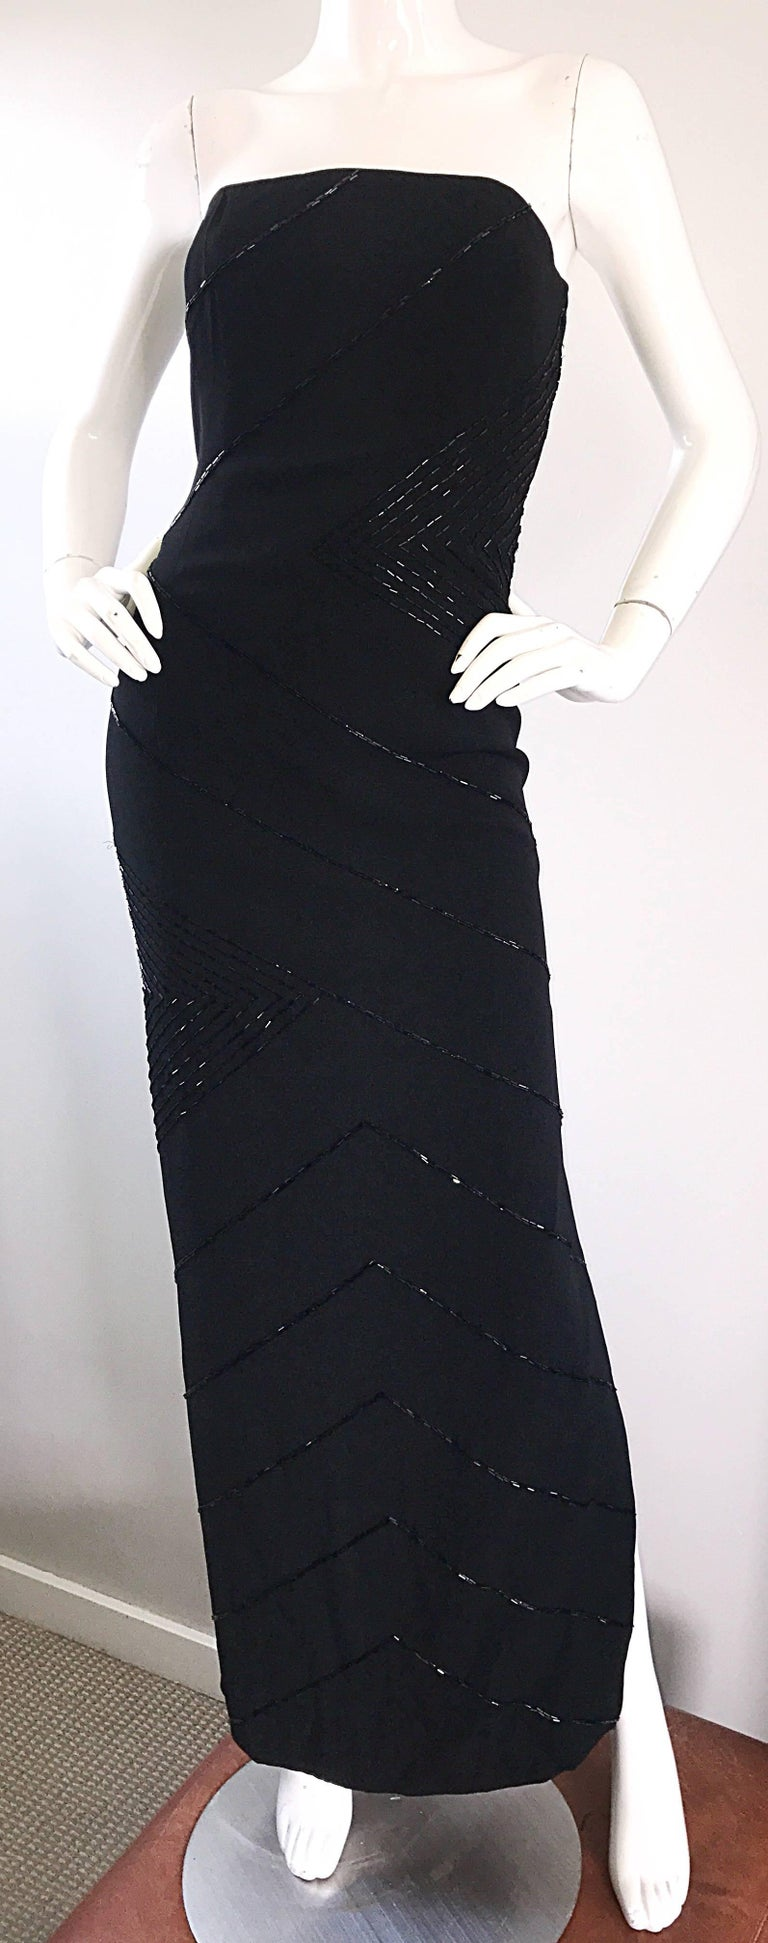 Vintage BIll Blass Black 1990s Beaded Size 8 90s Strapless Evening Dress For Sale 2